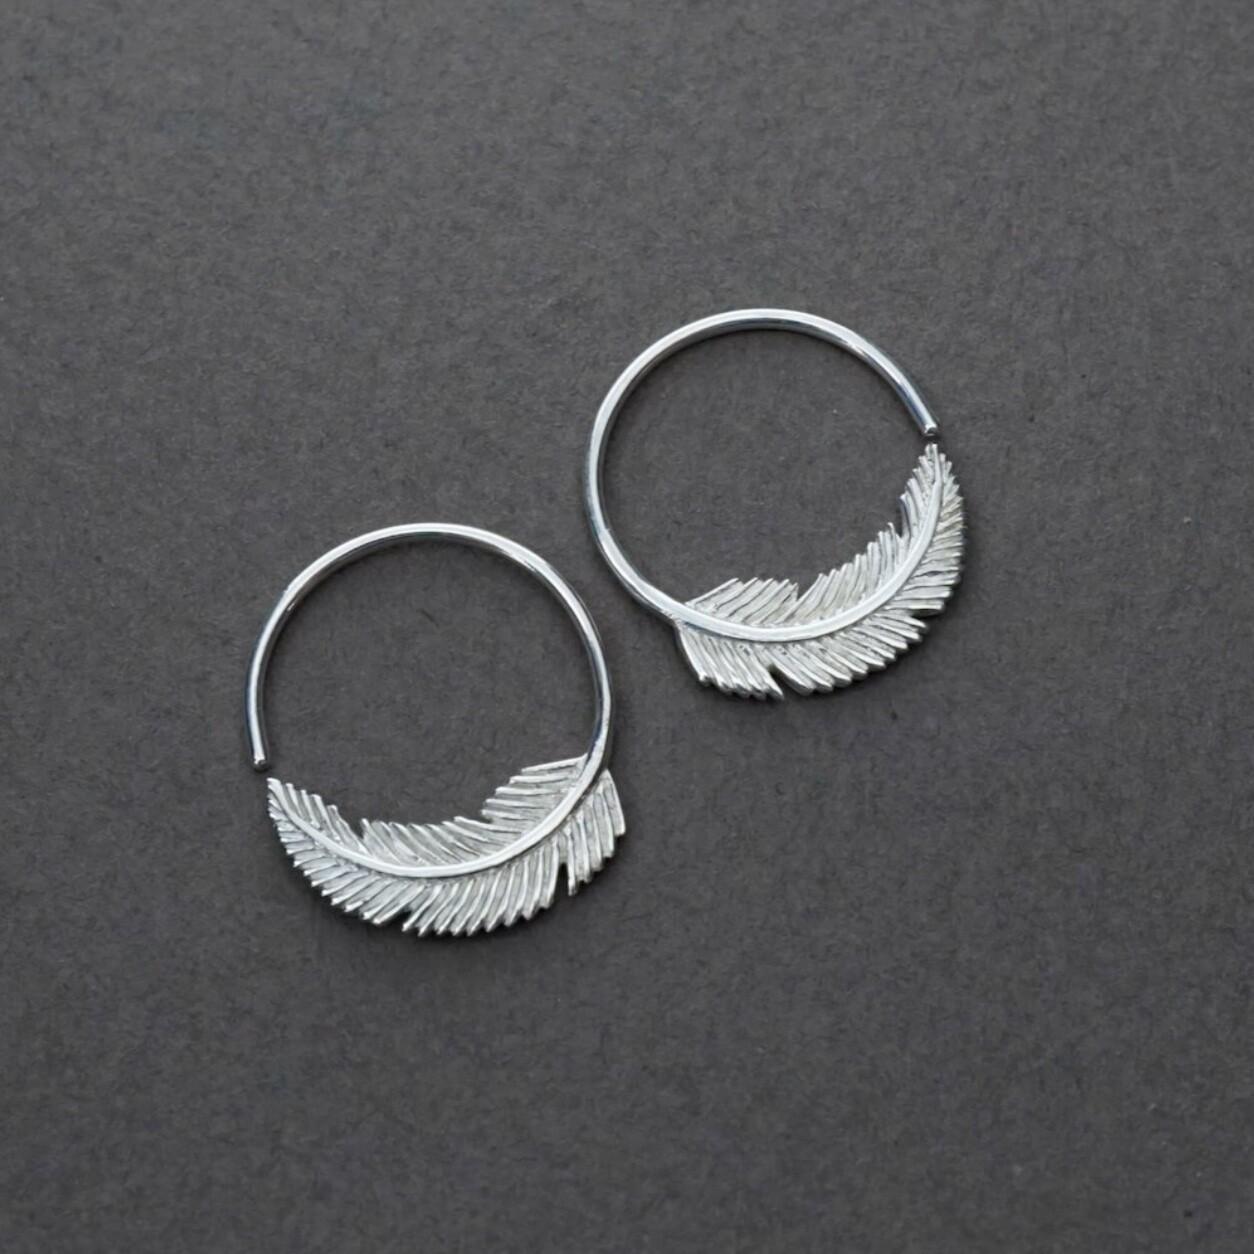 Little Feather Sterling Silver Sleeper Hoops - IBE264